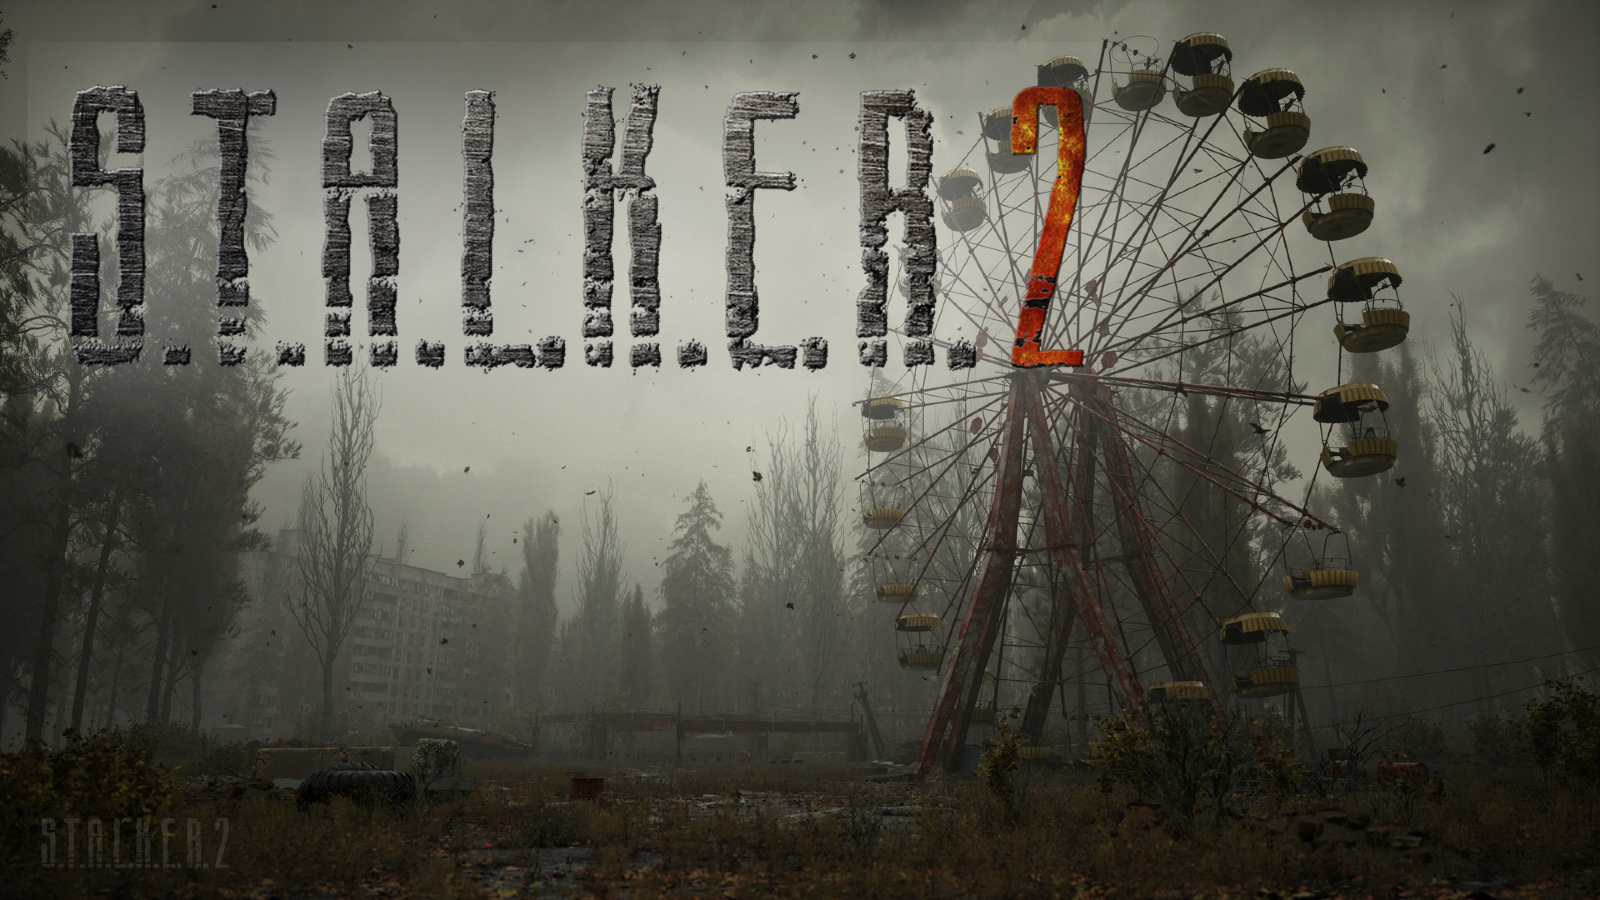 S.T.A.L.K.E.R 2 Chernobyl Ferris Wheel In-Game